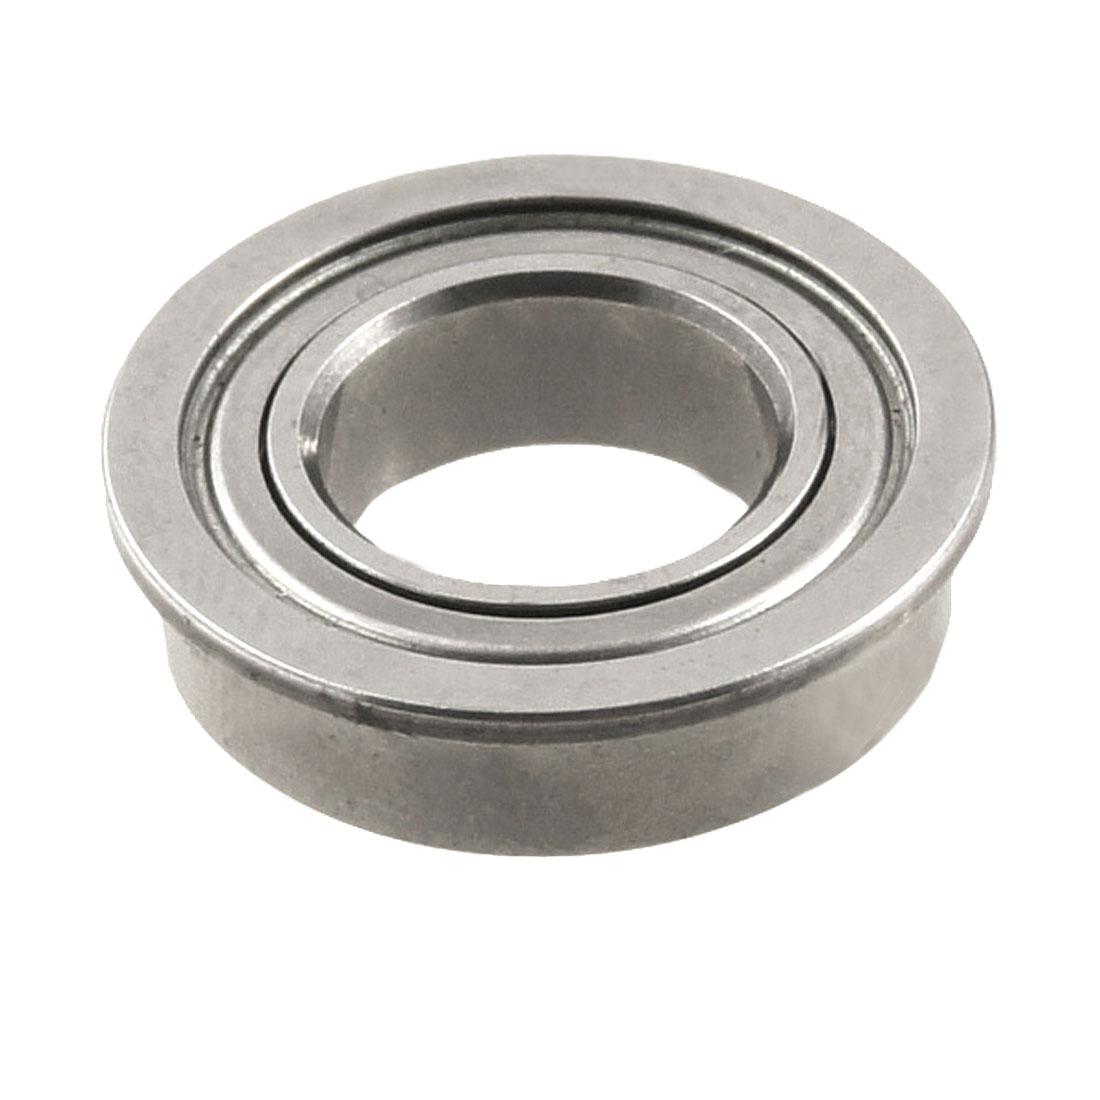 Silver Tone 14mm x 8mm x 4mm Shield Premium Ball Bearing